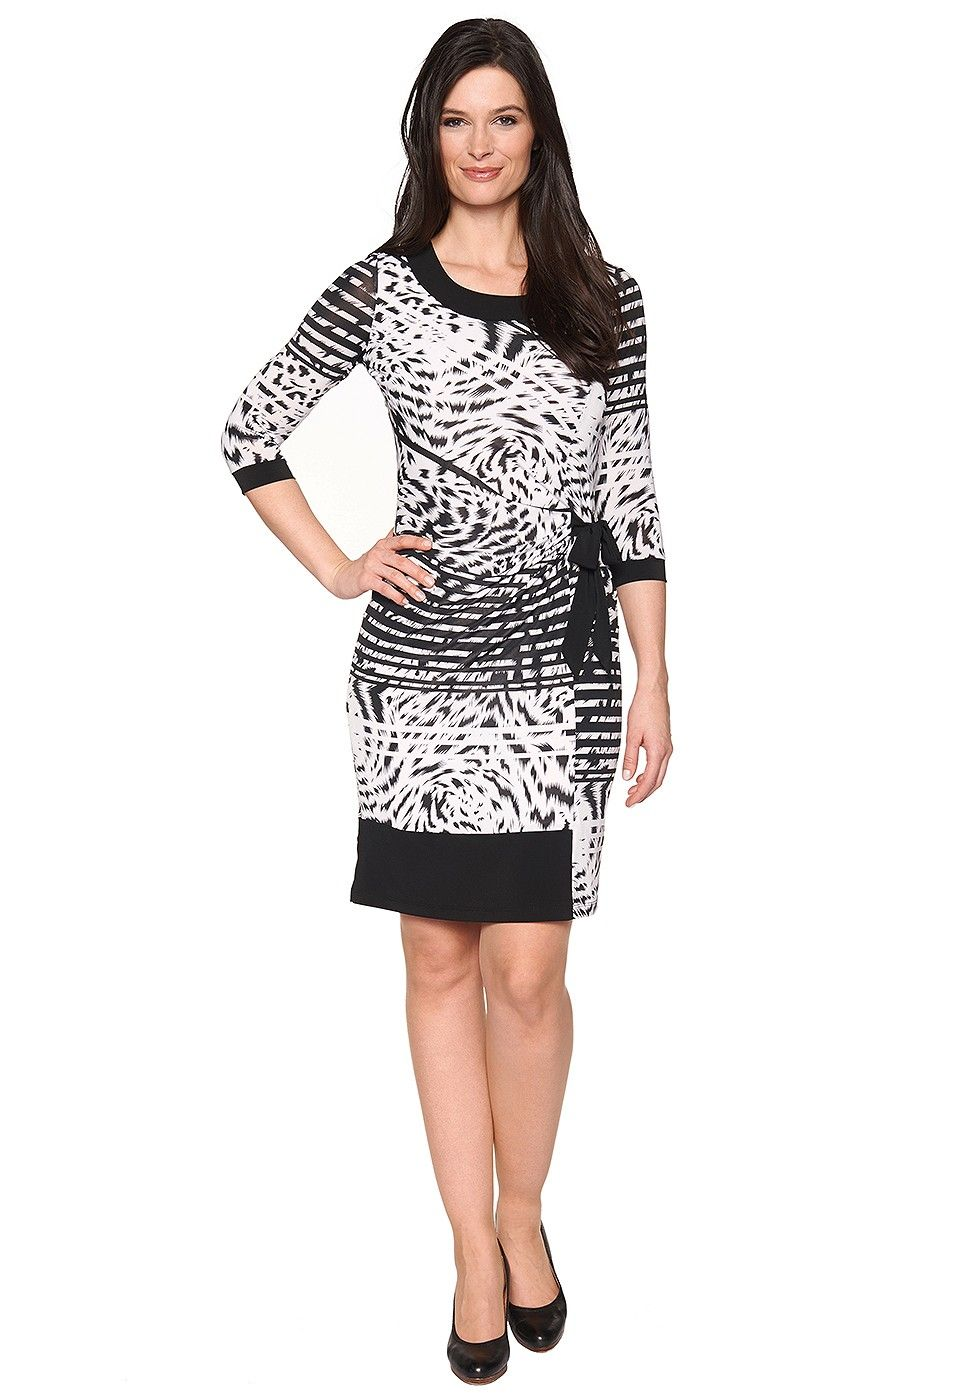 Kleid knielang - BONITA E-Shop  Modestil, Tuch, Kleider